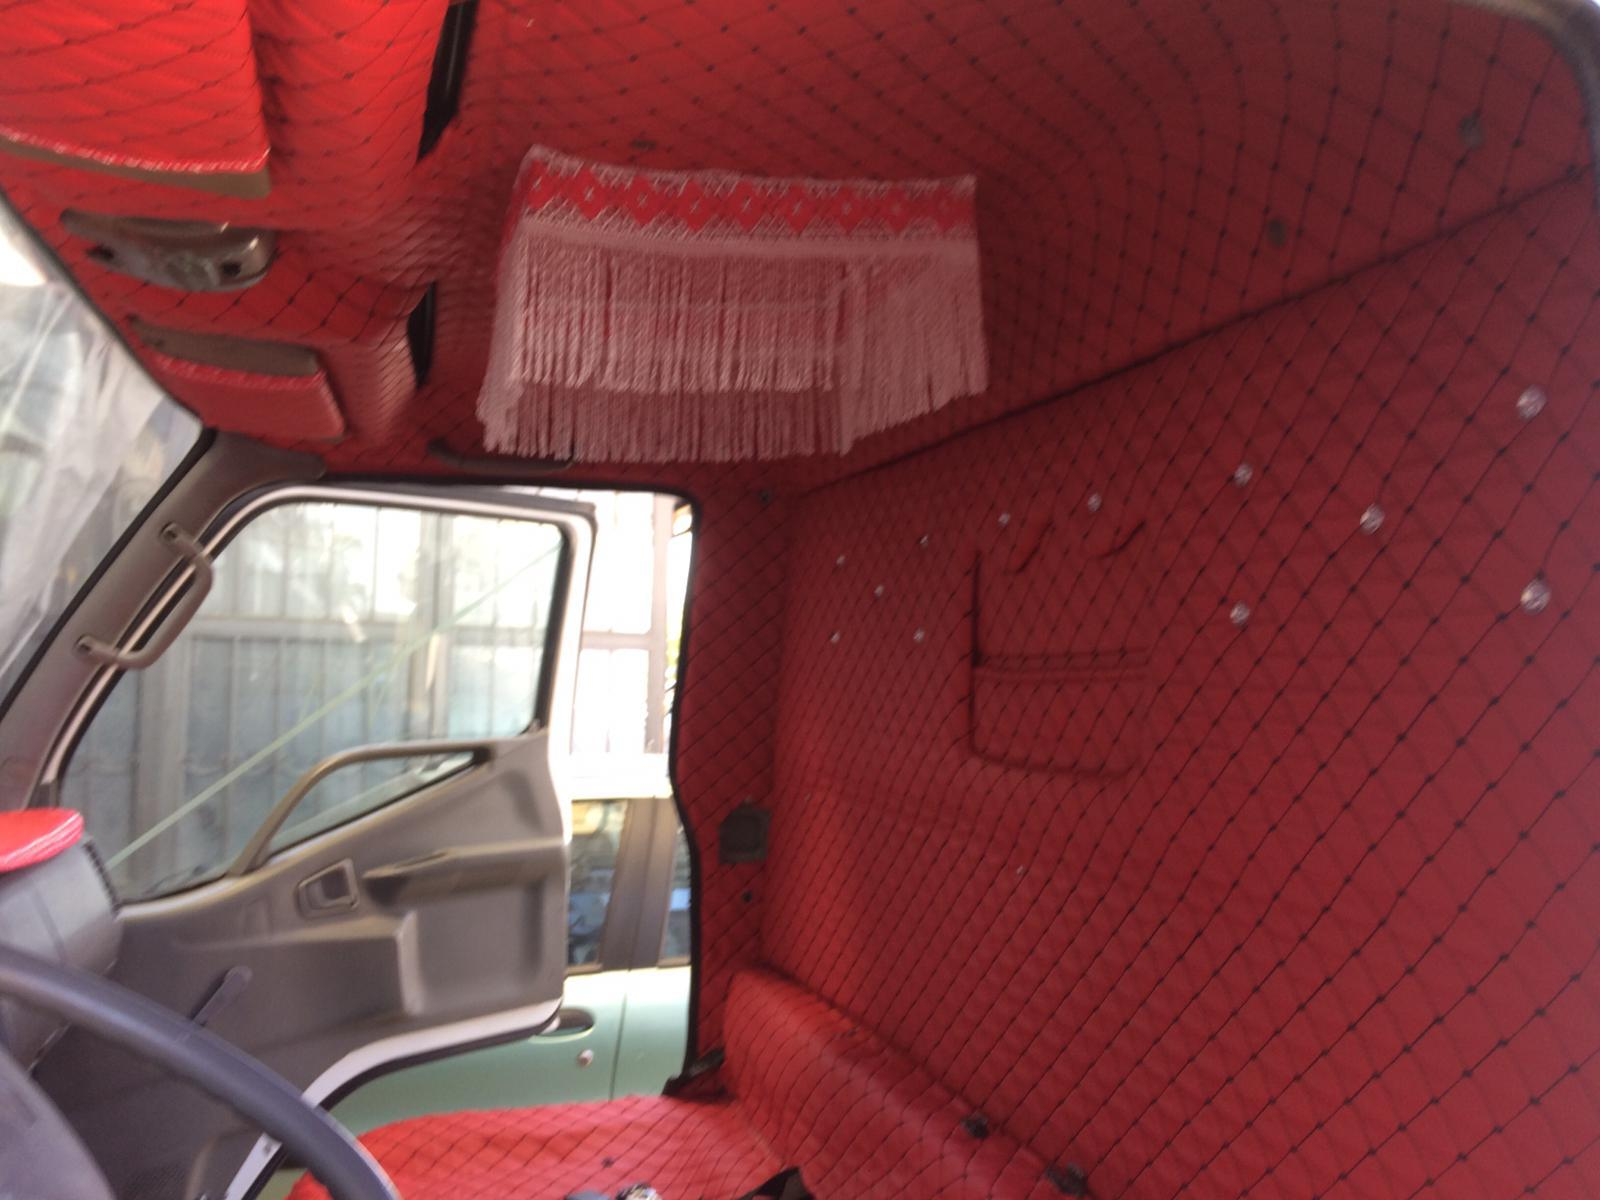 Mitsubishi kamyonet tavan, taban, döşeme yapımı